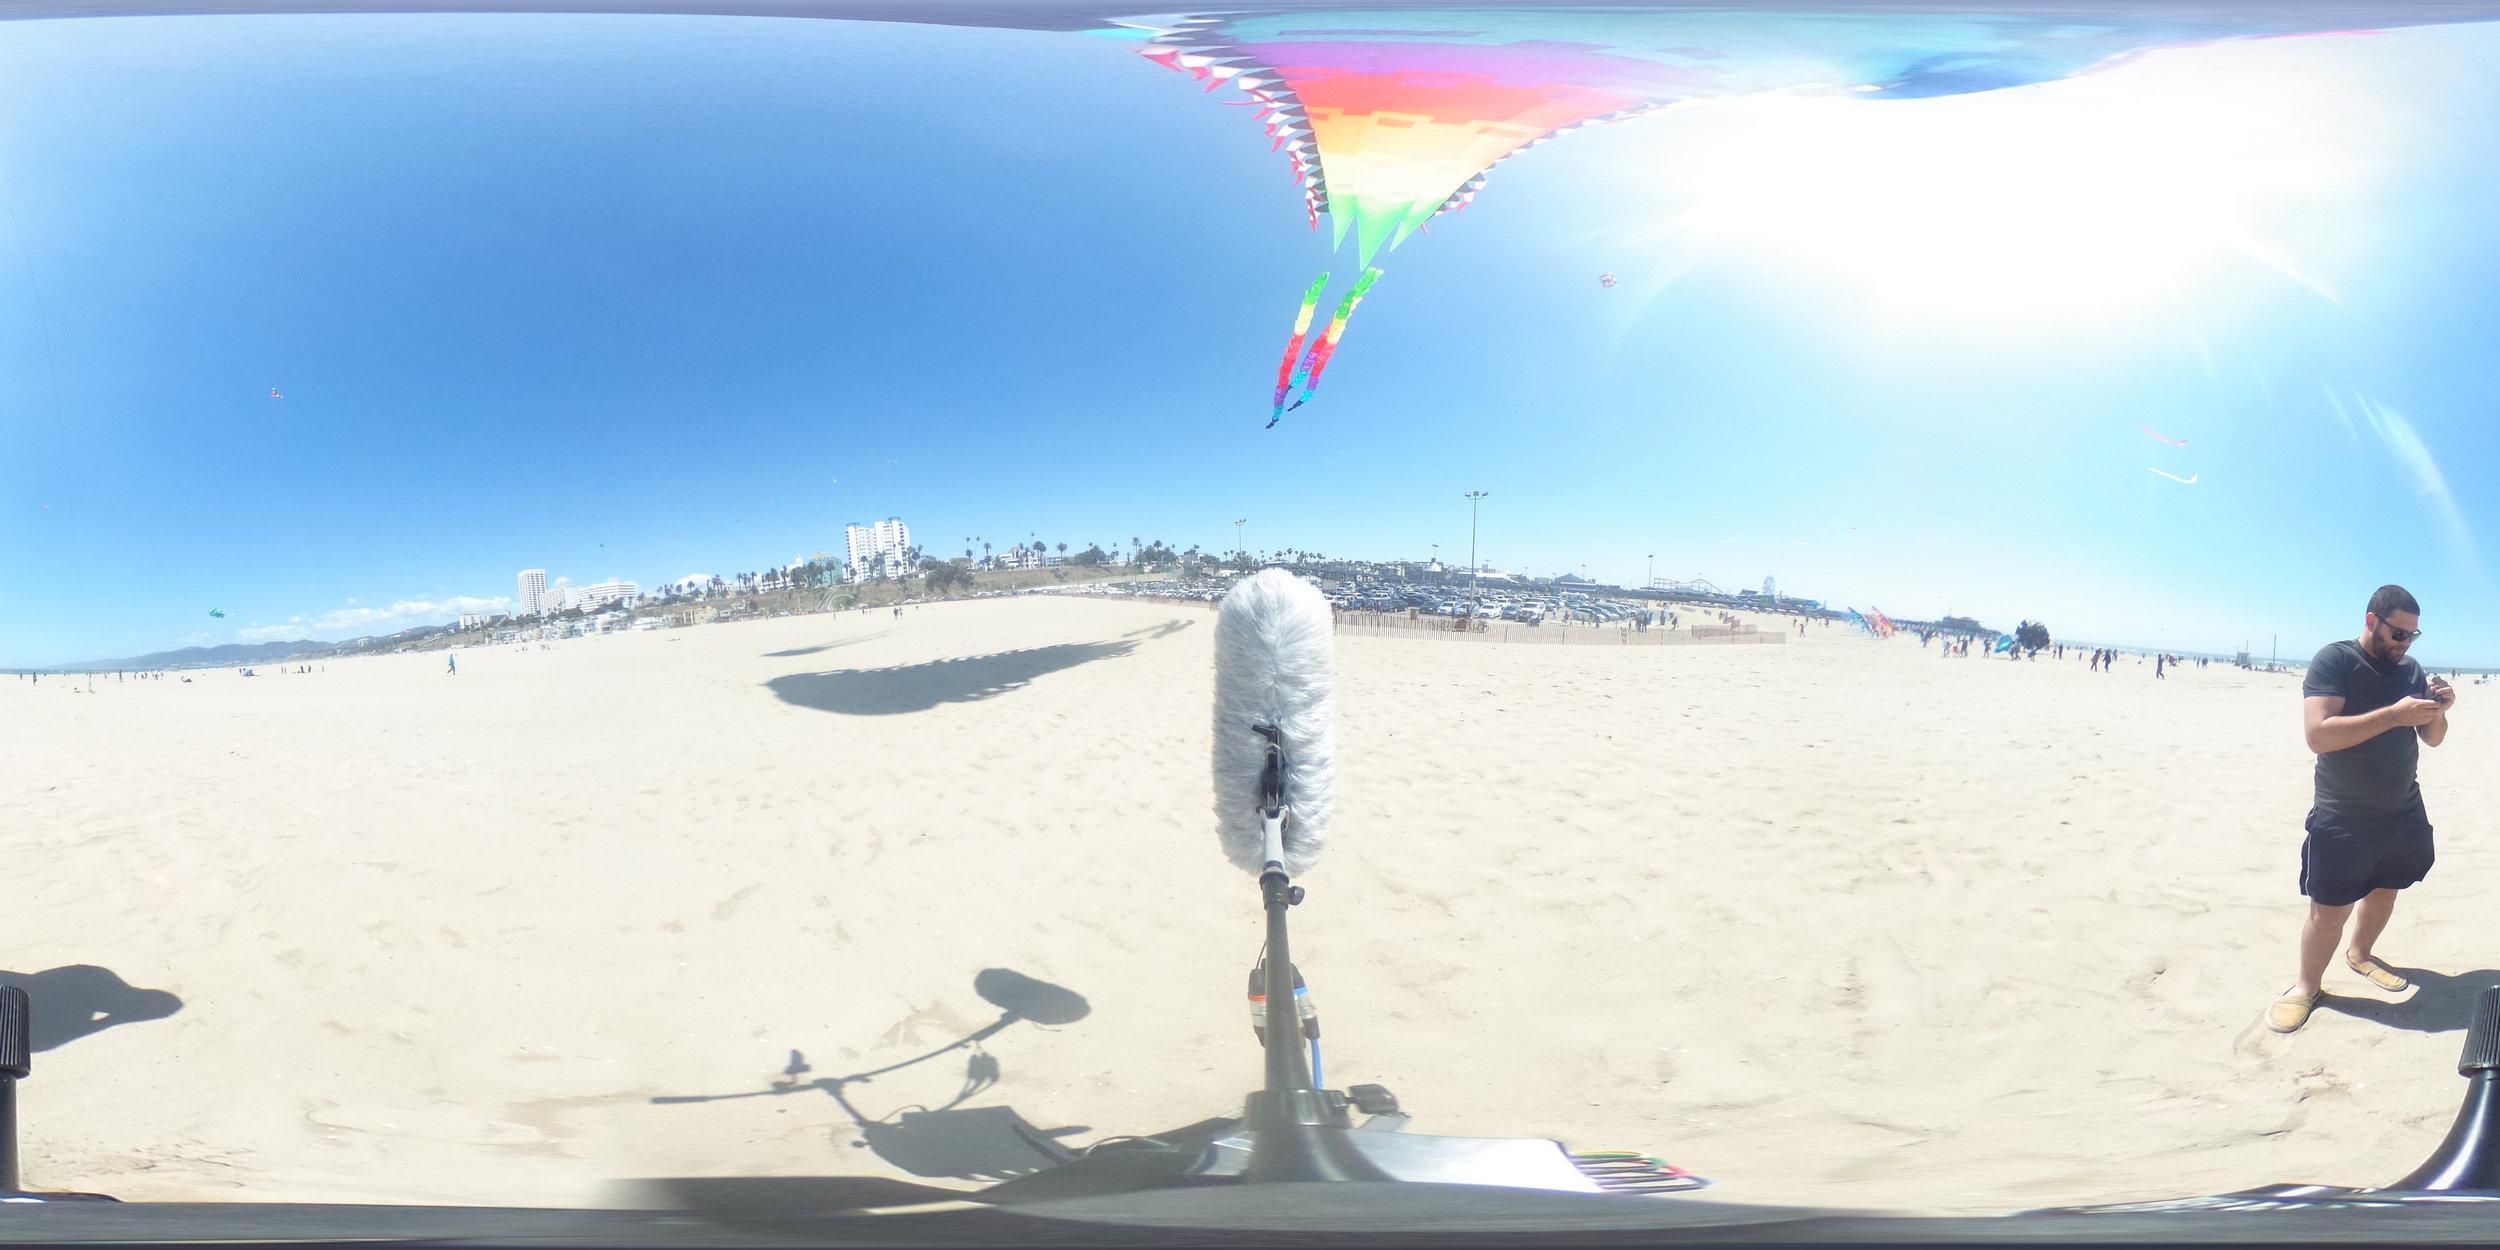 EXT_Day_Beach_HeavyWind_KiteOverhead_WindThroughFabric_TonalWind_DistantWalla_DistantPlaneOverhead_JPEG.JPG